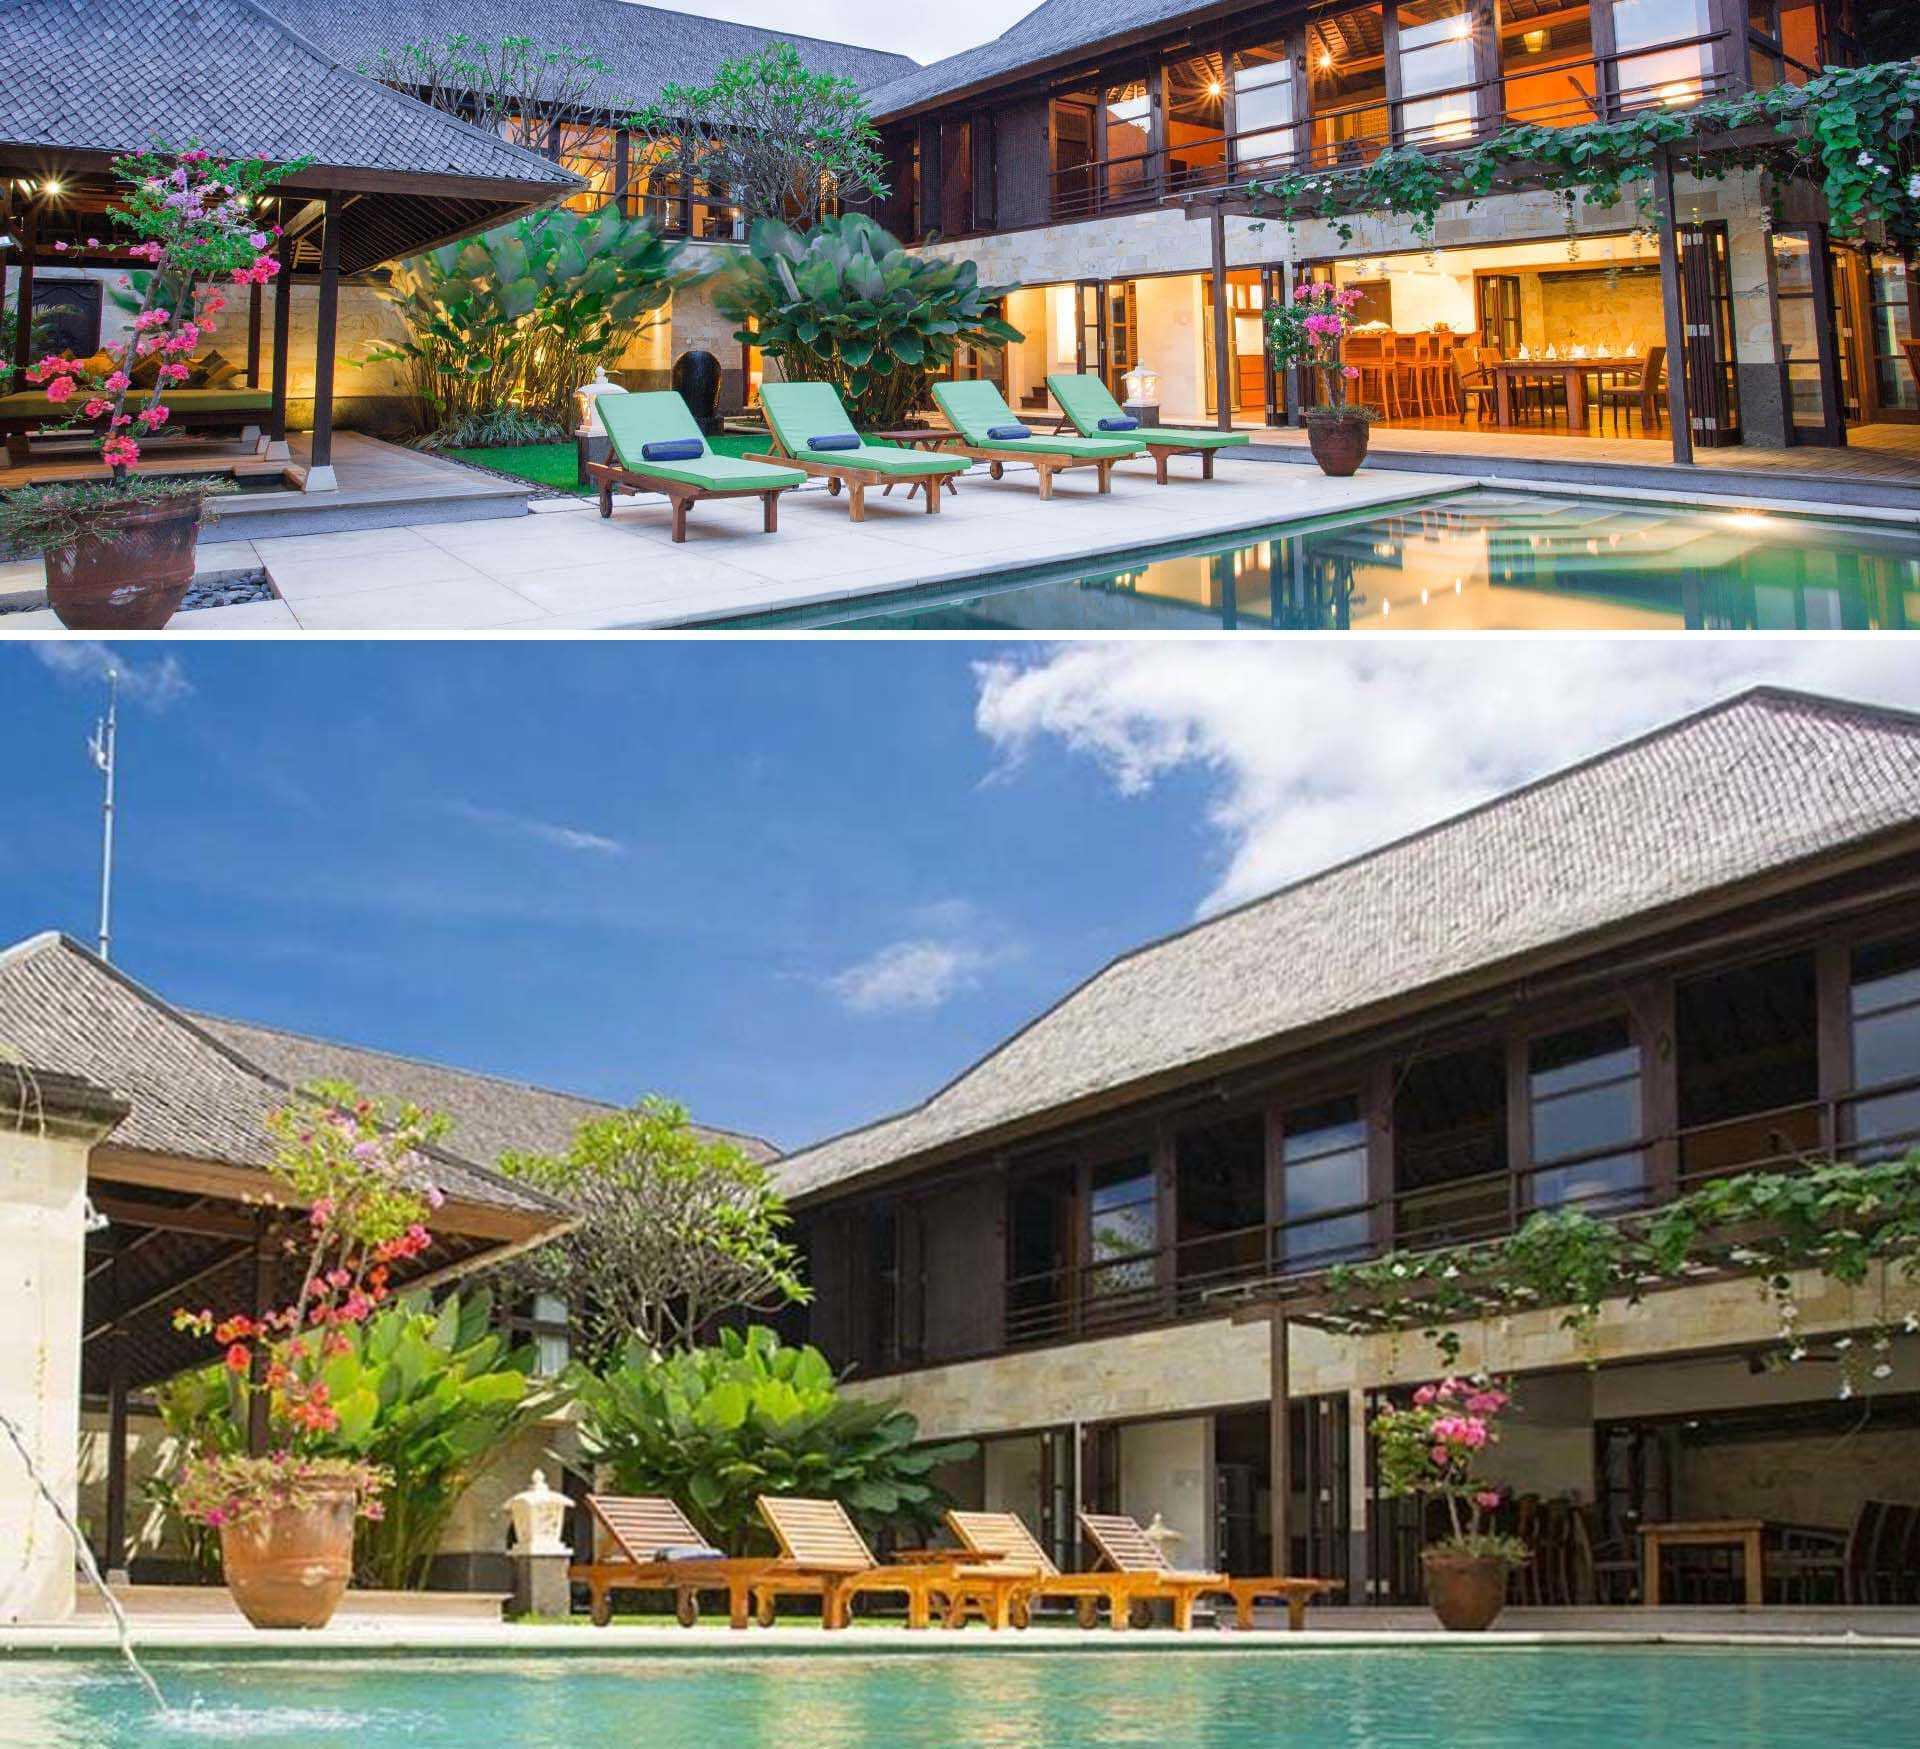 Agung Budi Raharsa | Architecture & Engineering Bayu Gita Residence - Bali Bali, Indonesia Bali, Indonesia Agung-Budi-Raharsa-Bayu-Gita-Residence  88474